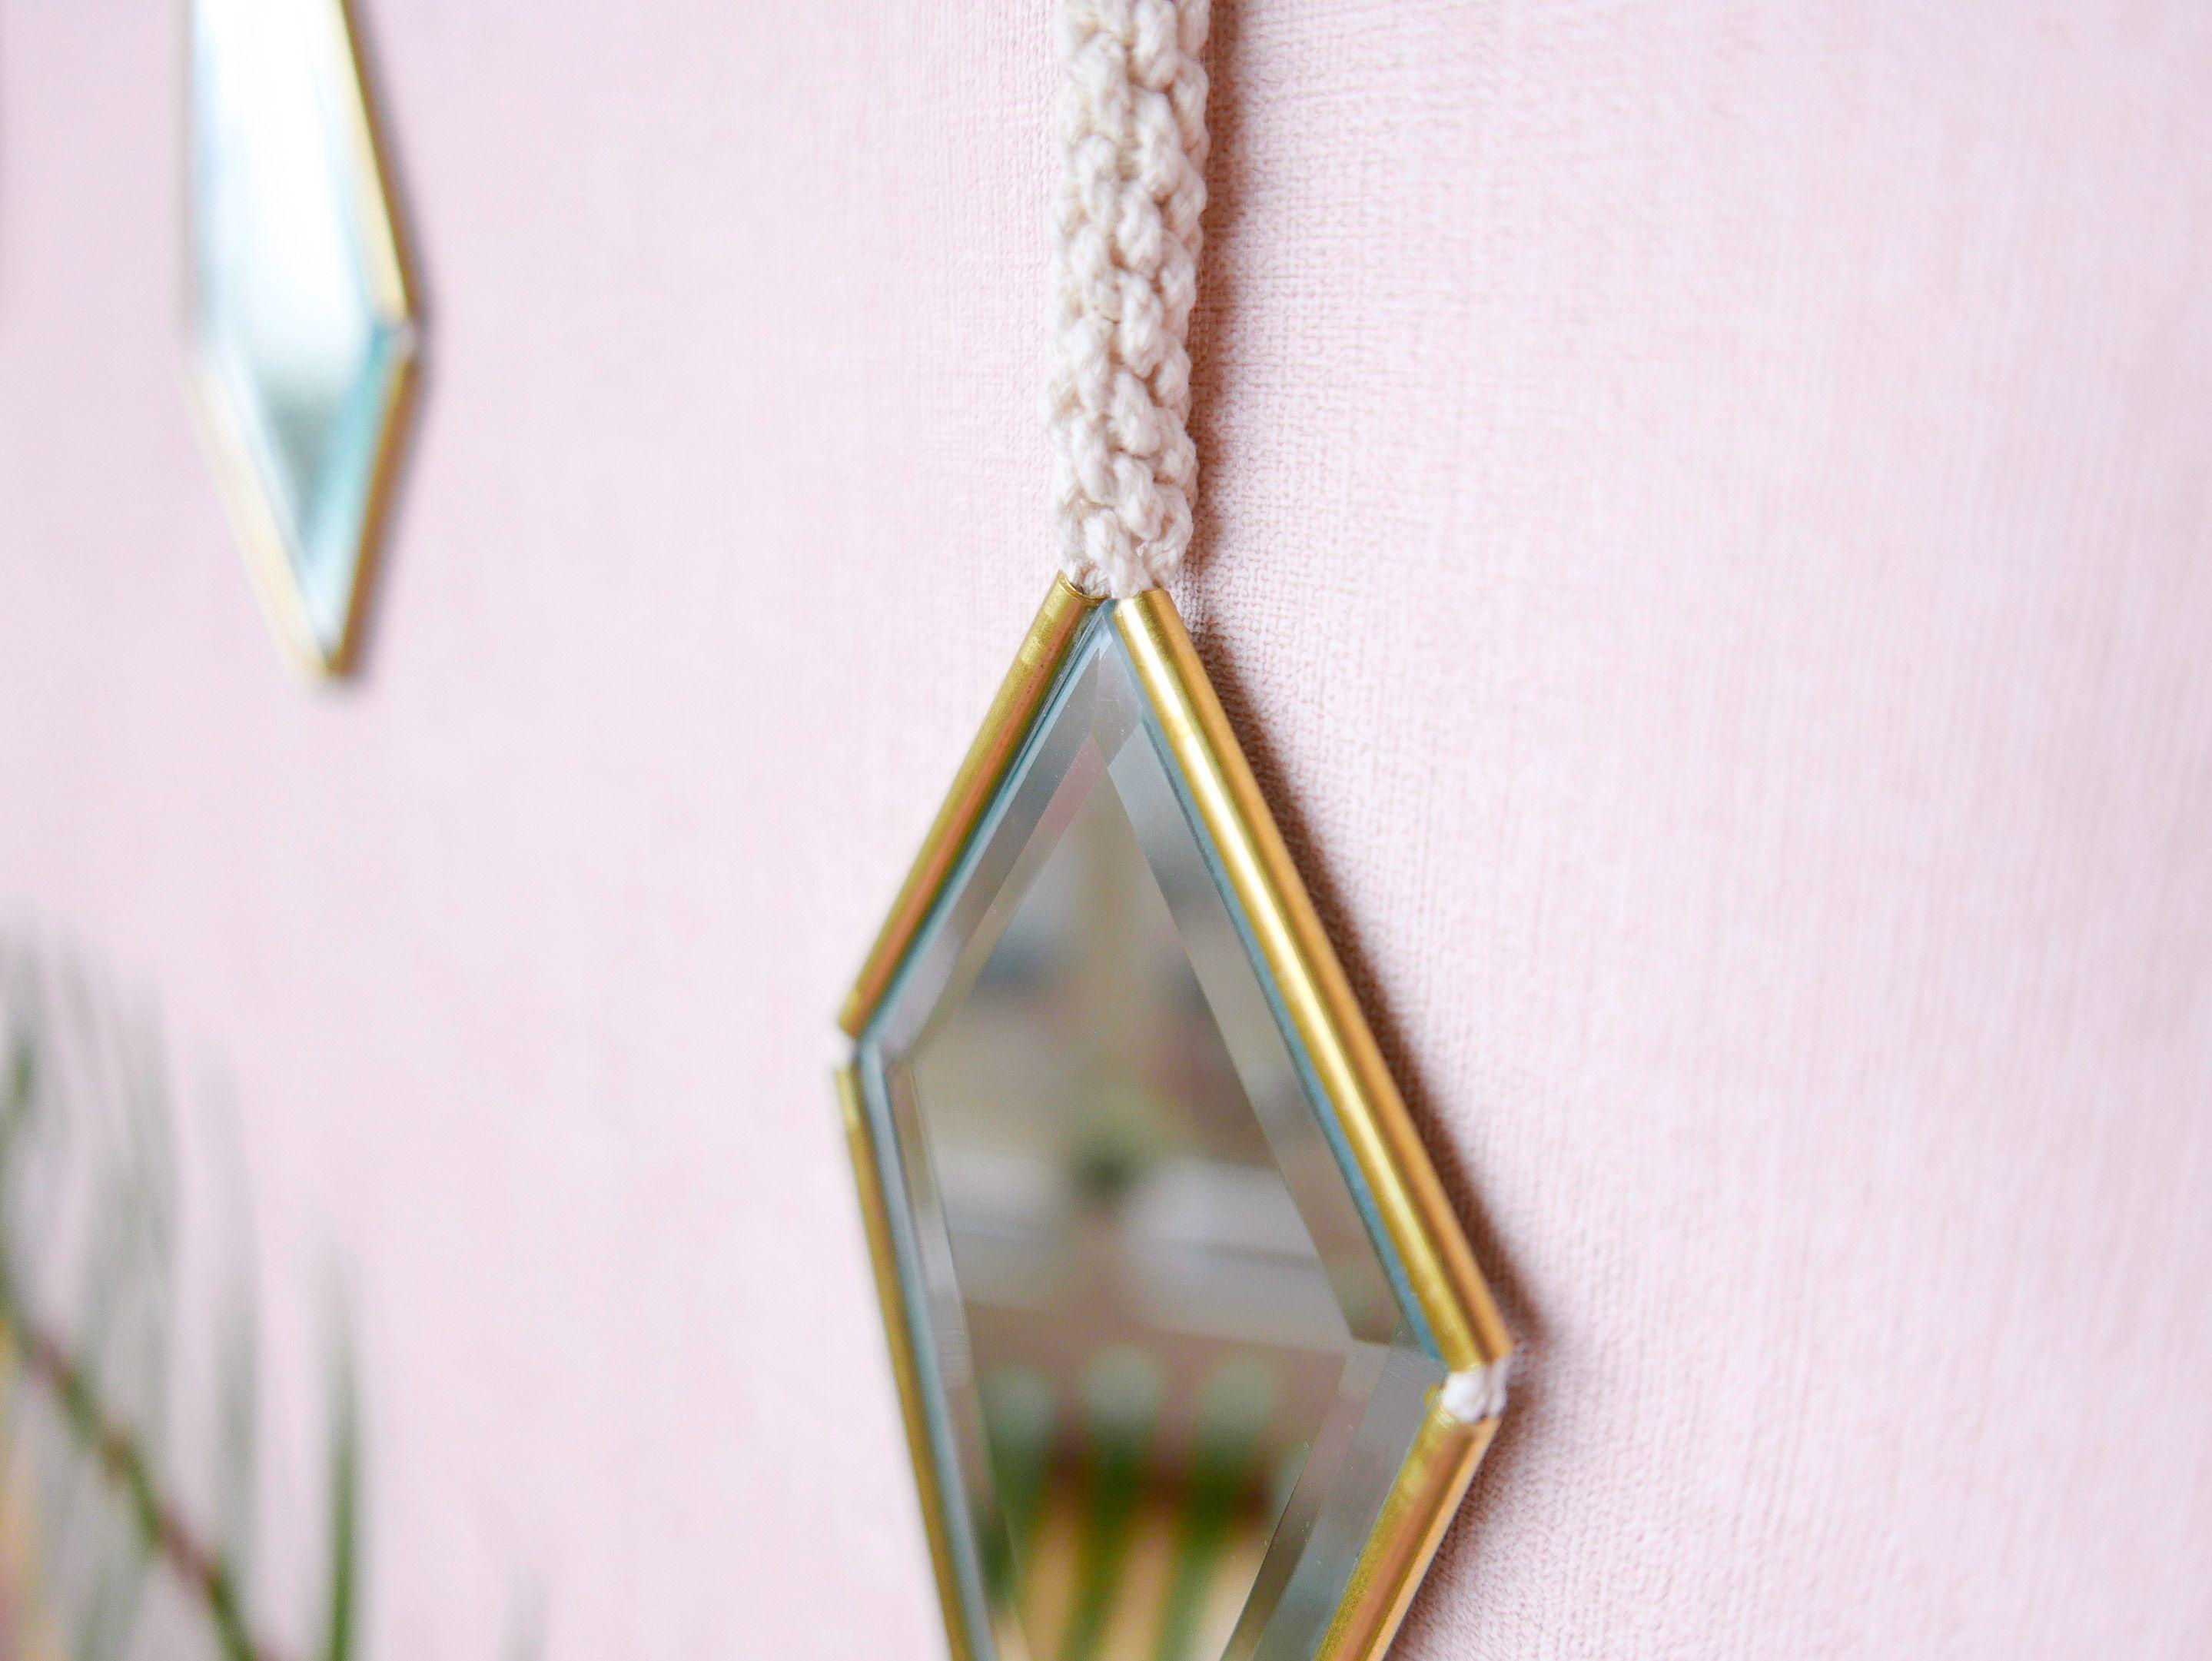 D O N - Vintage brass mirror - Miroir vintage en laiton - Golden - Macramé - Suspension murale - Modern Wall hanging